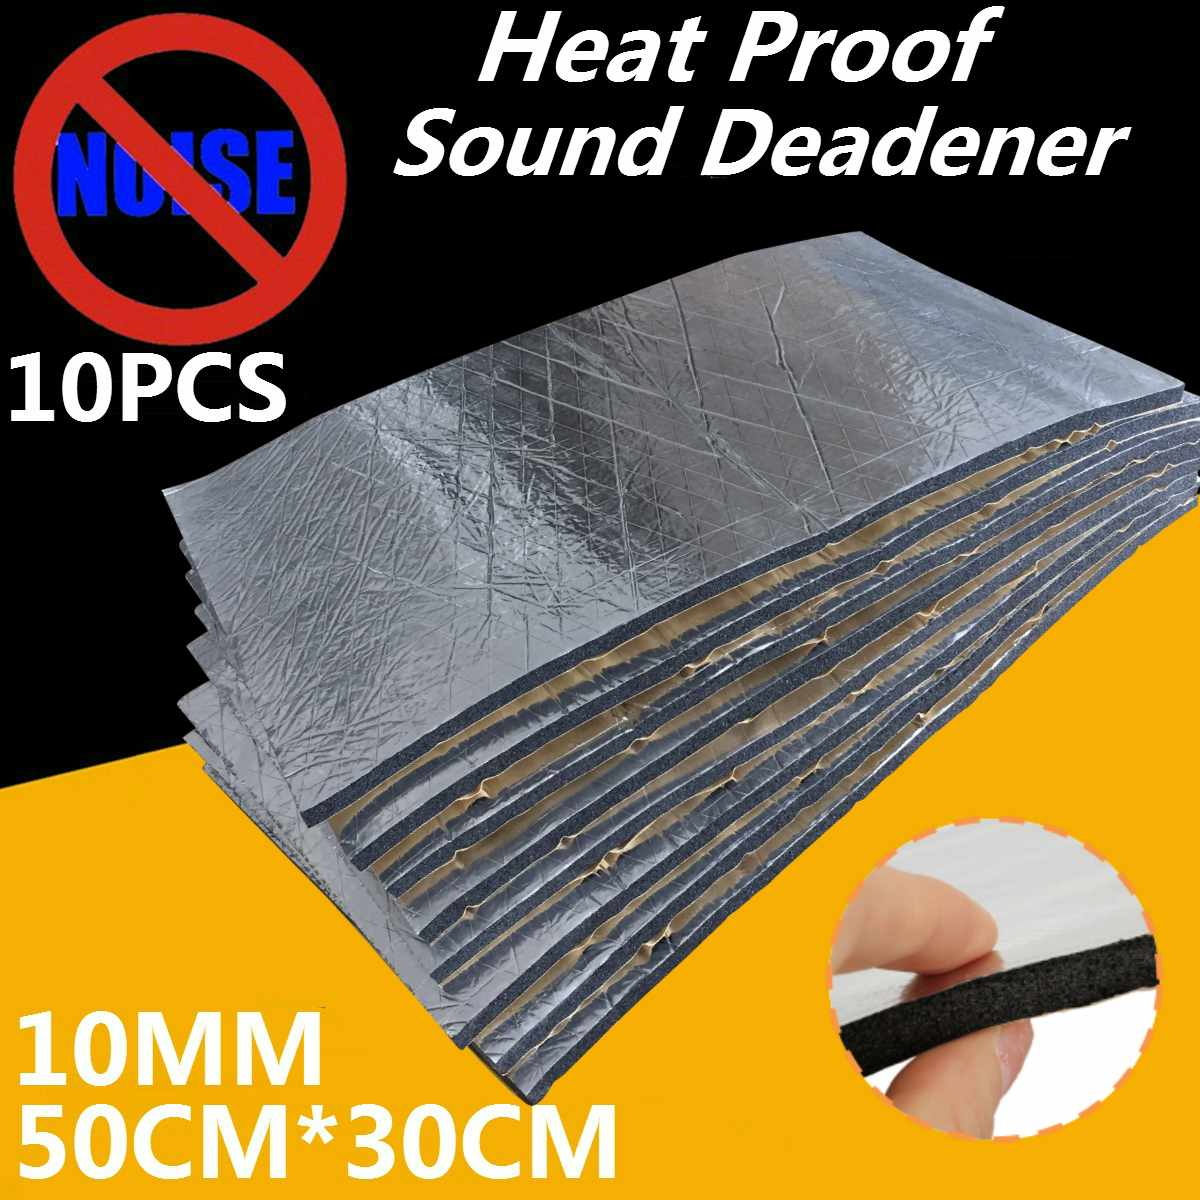 10PCS 10MM Noise insulation For Car Foam Car Sound Heat Proof Auto Insulation Car Engine Firewall Heat Aluminum Foam